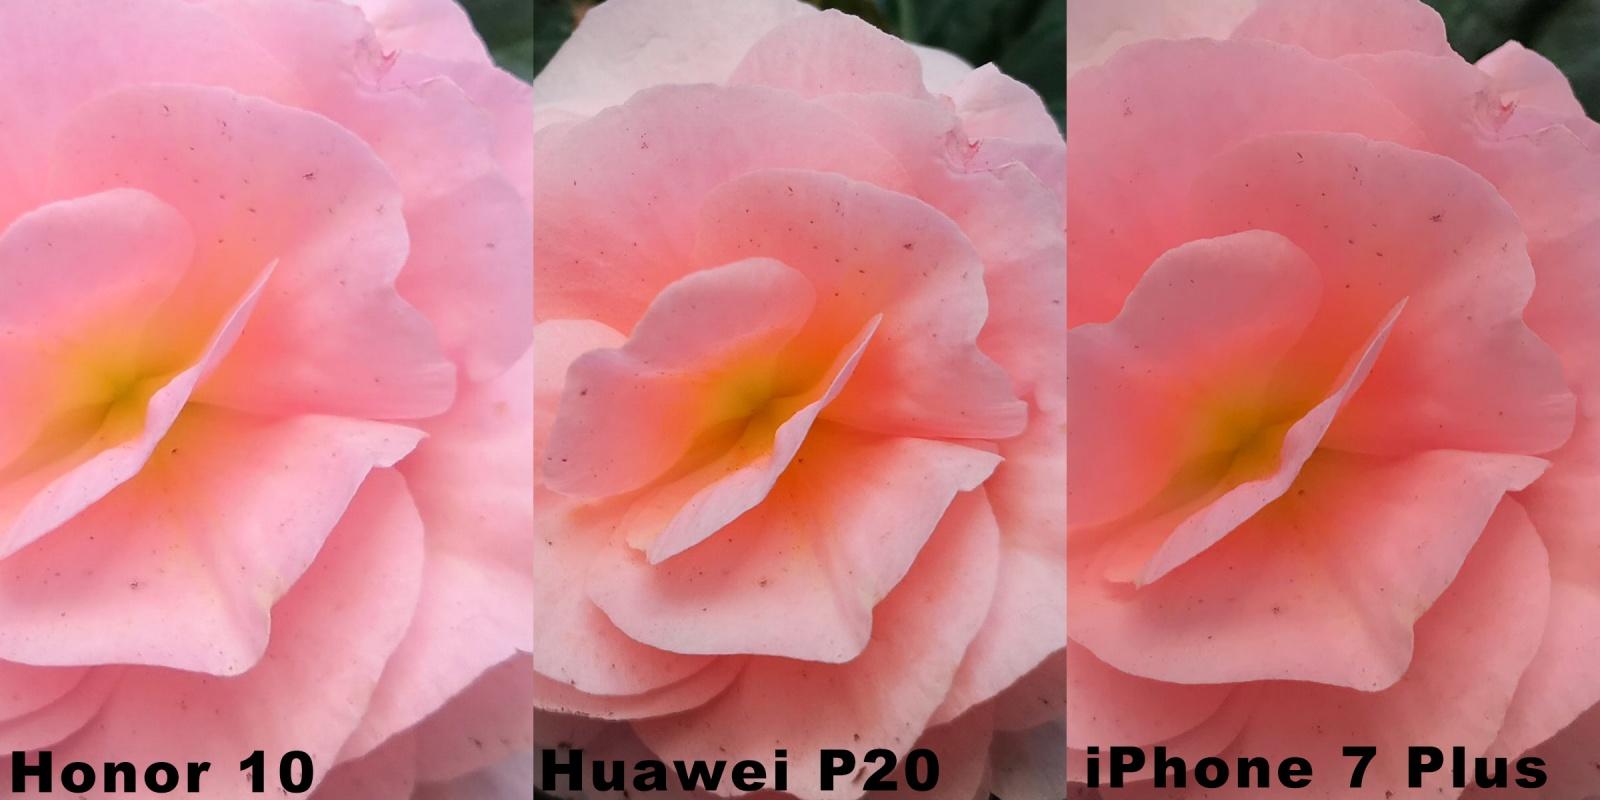 Как фотографирует новый Honor 10. Сравниваем с Huawei P20 и iPhone 7 Plus - 20